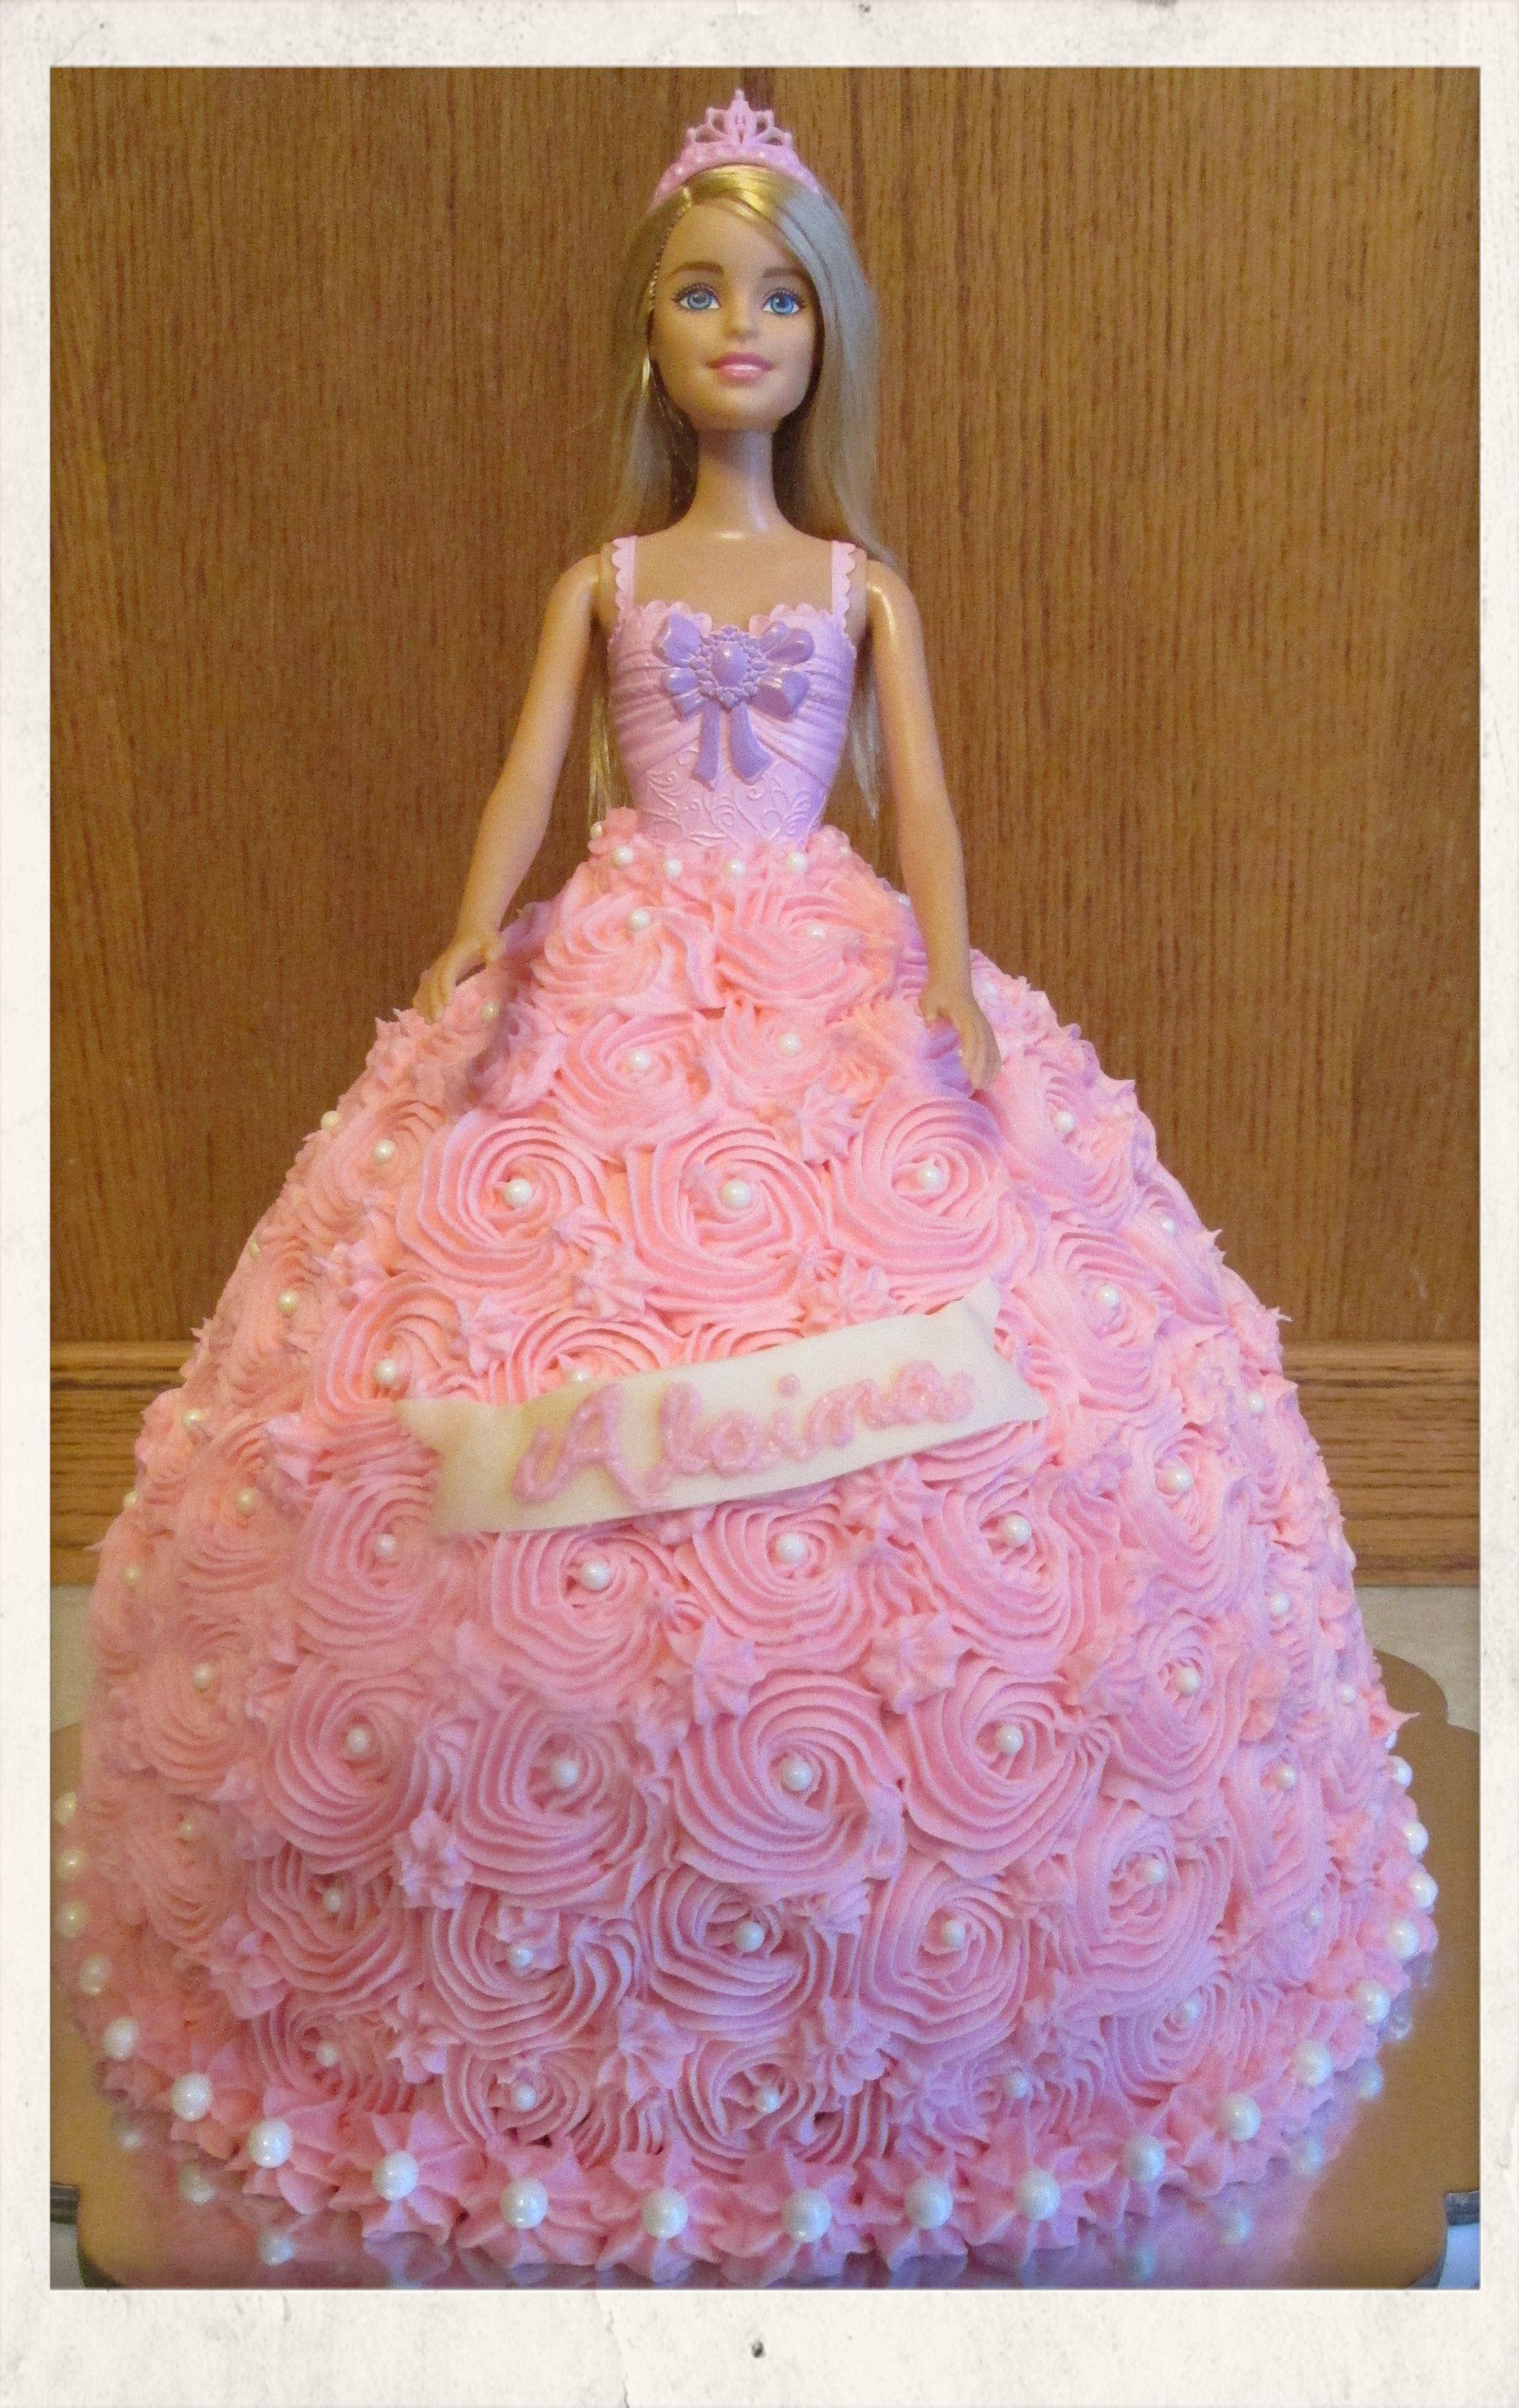 Barbie Doll Princess Cake All Buttercream